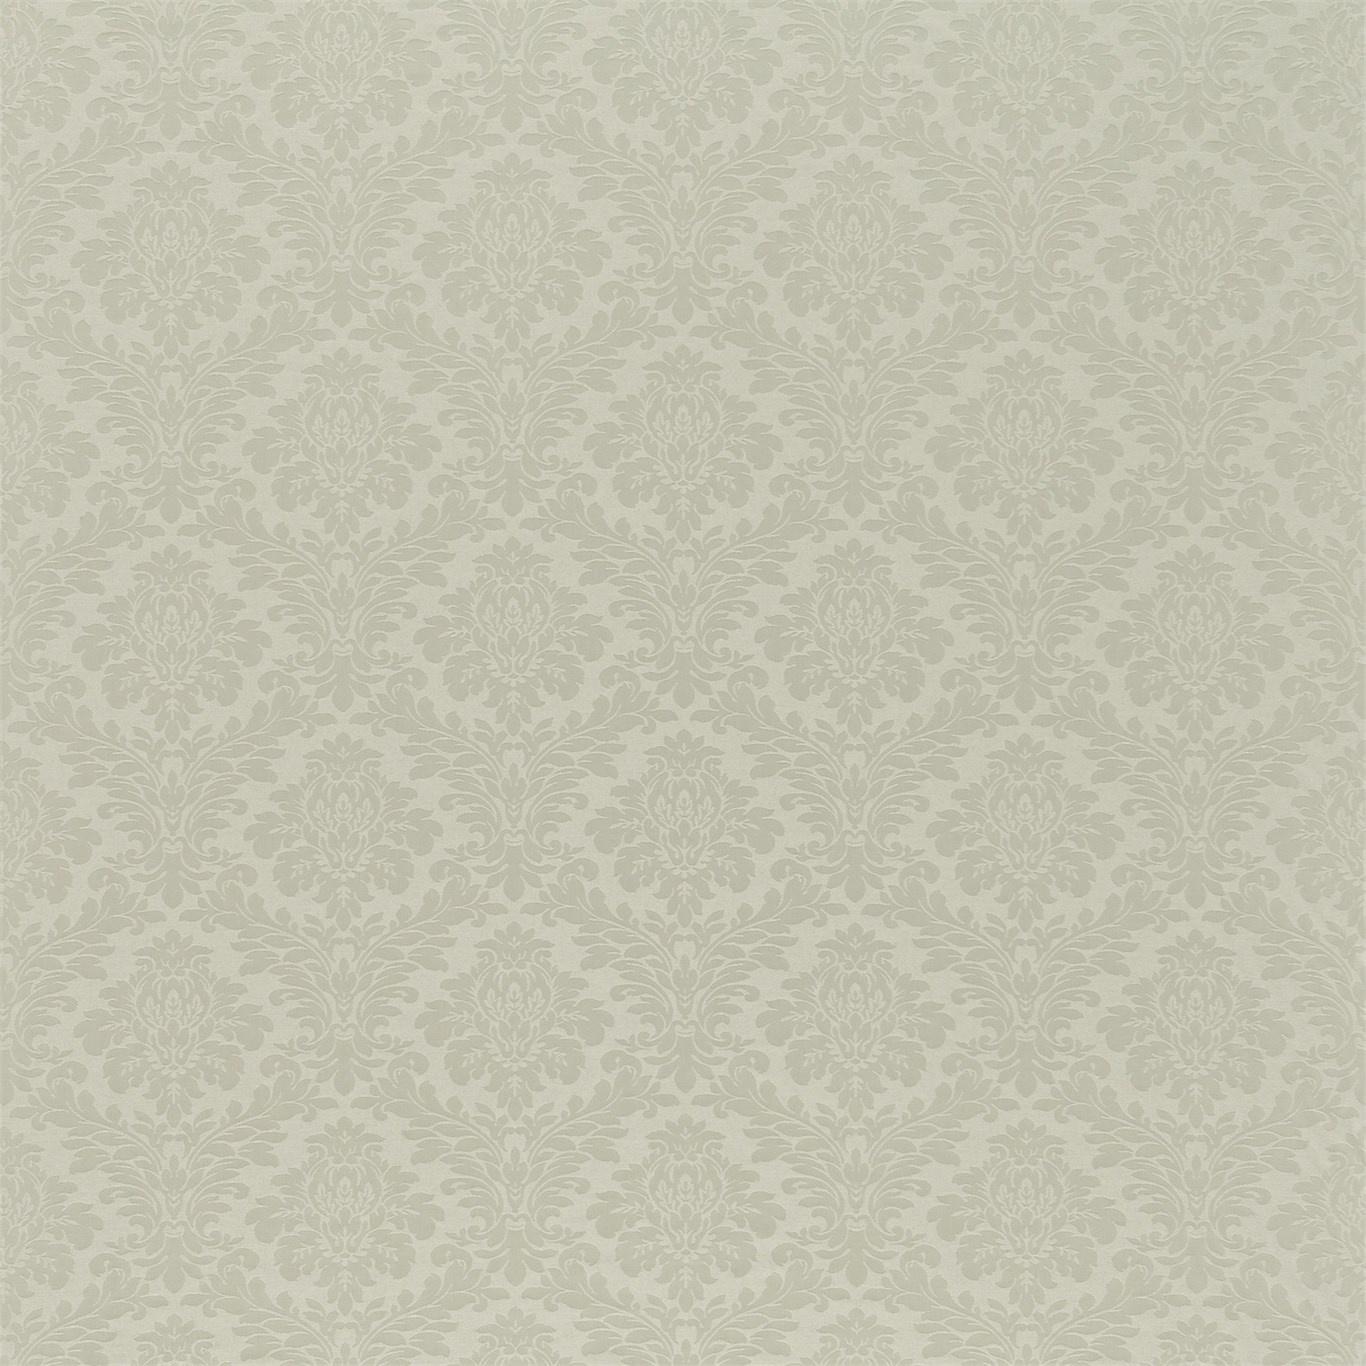 Image of Sanderson Lymington Damask Silver Fabric 232604